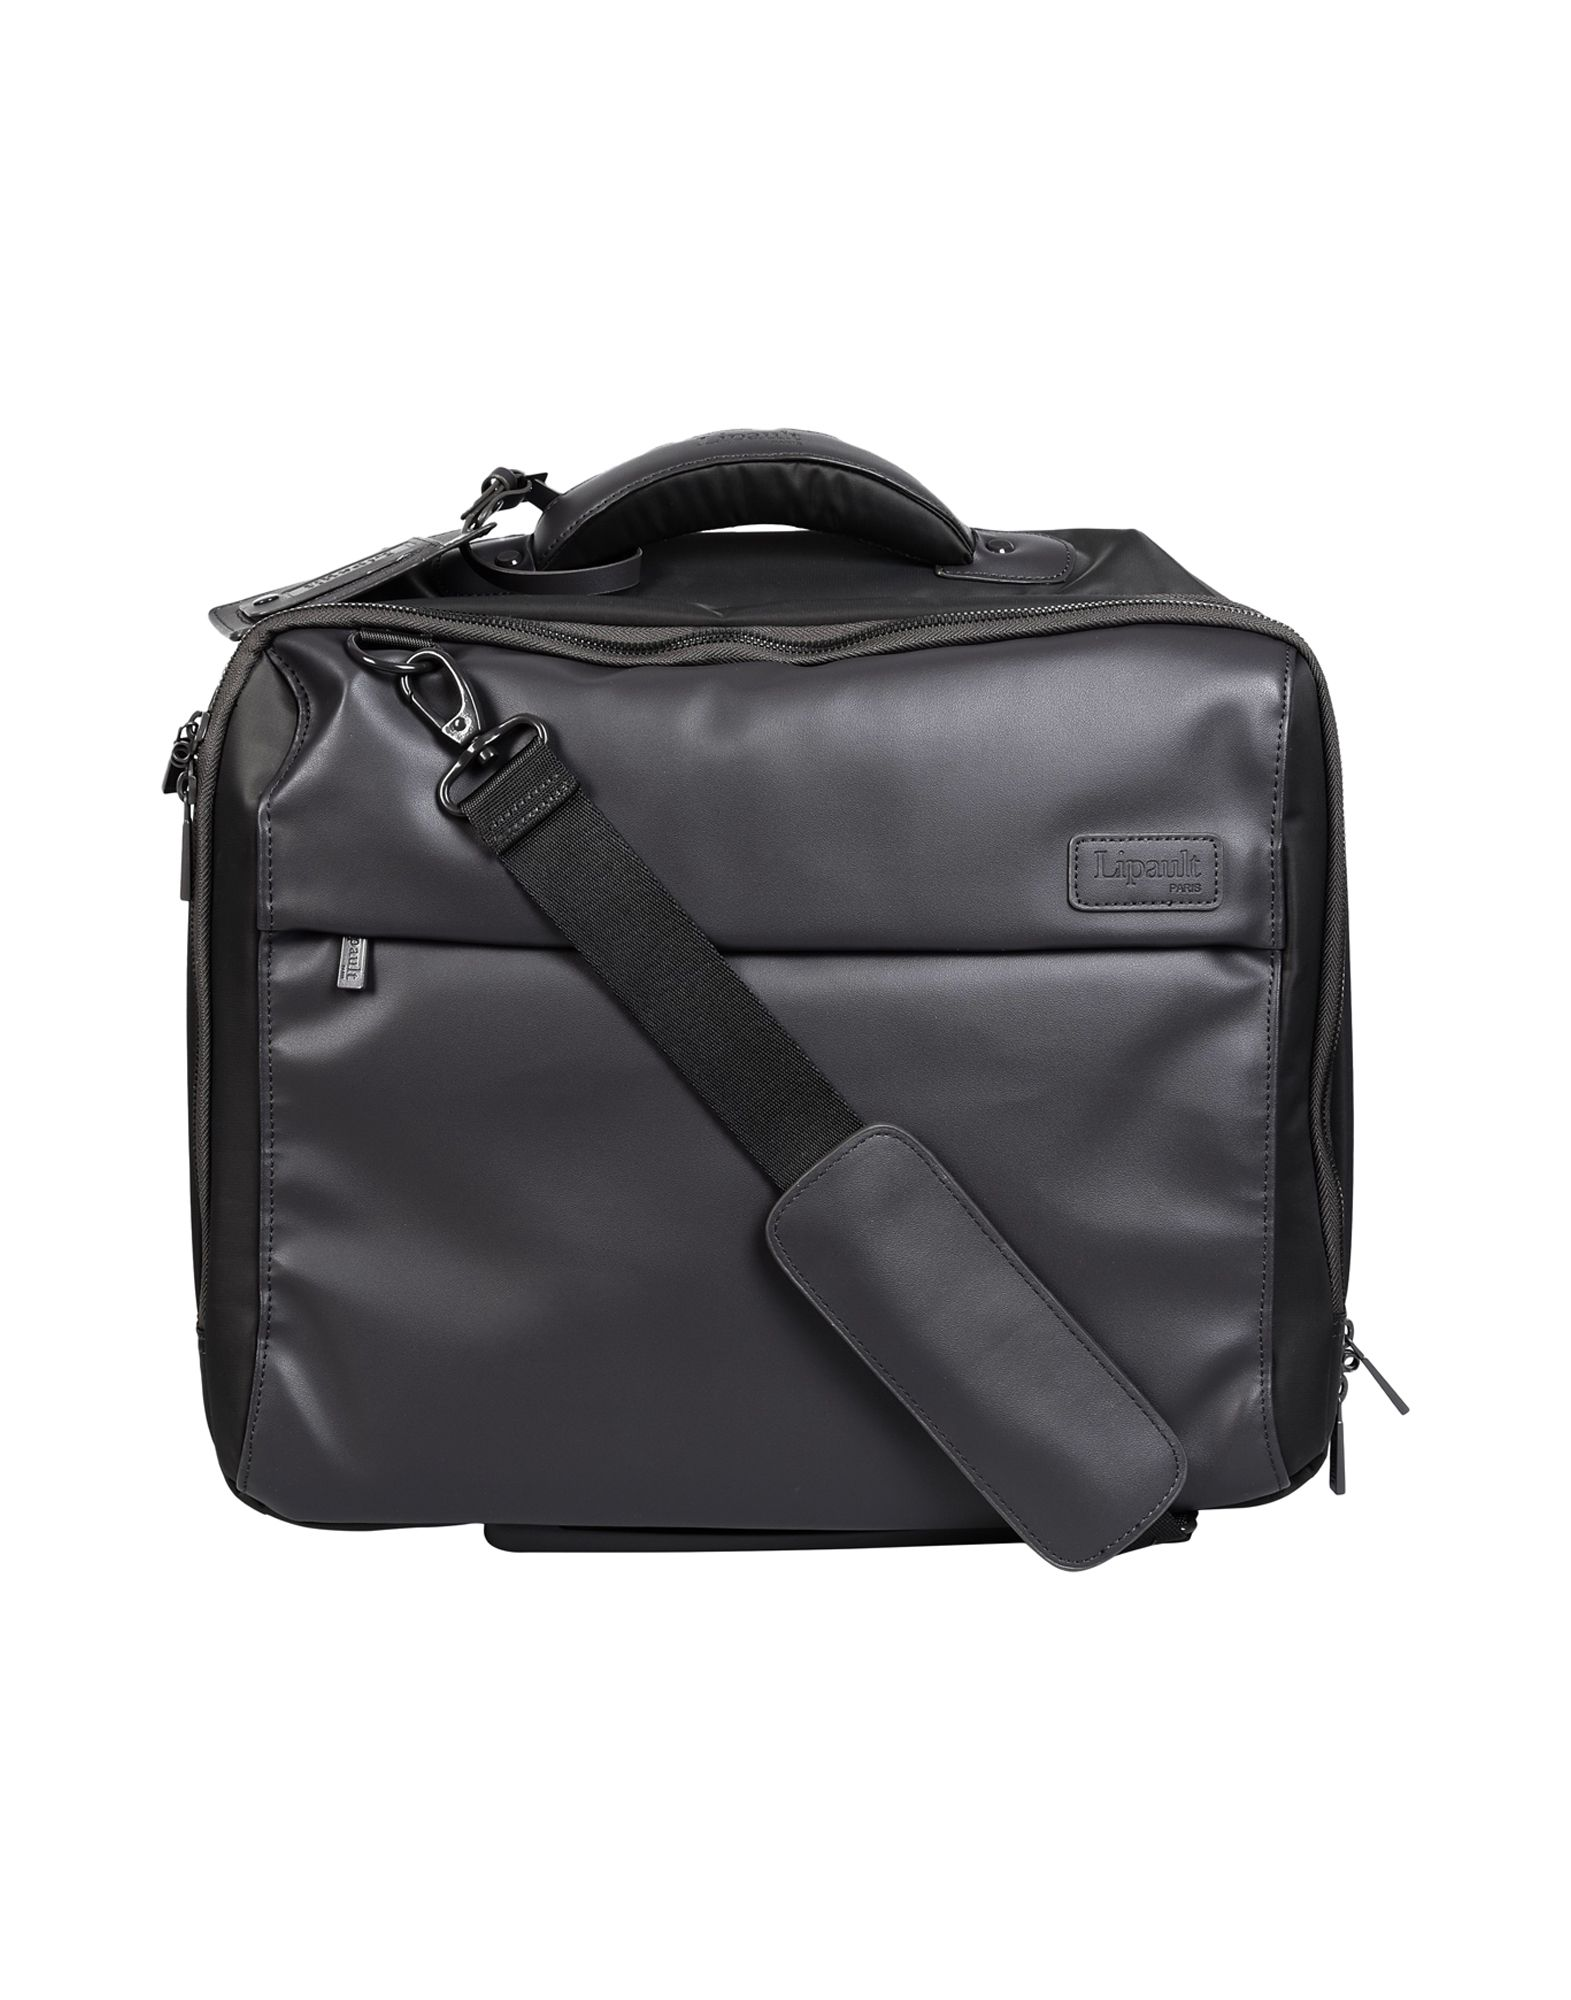 LIPAULT Чемодан/сумка на колесиках lipault сумка lipault p51 91103 лавандовый